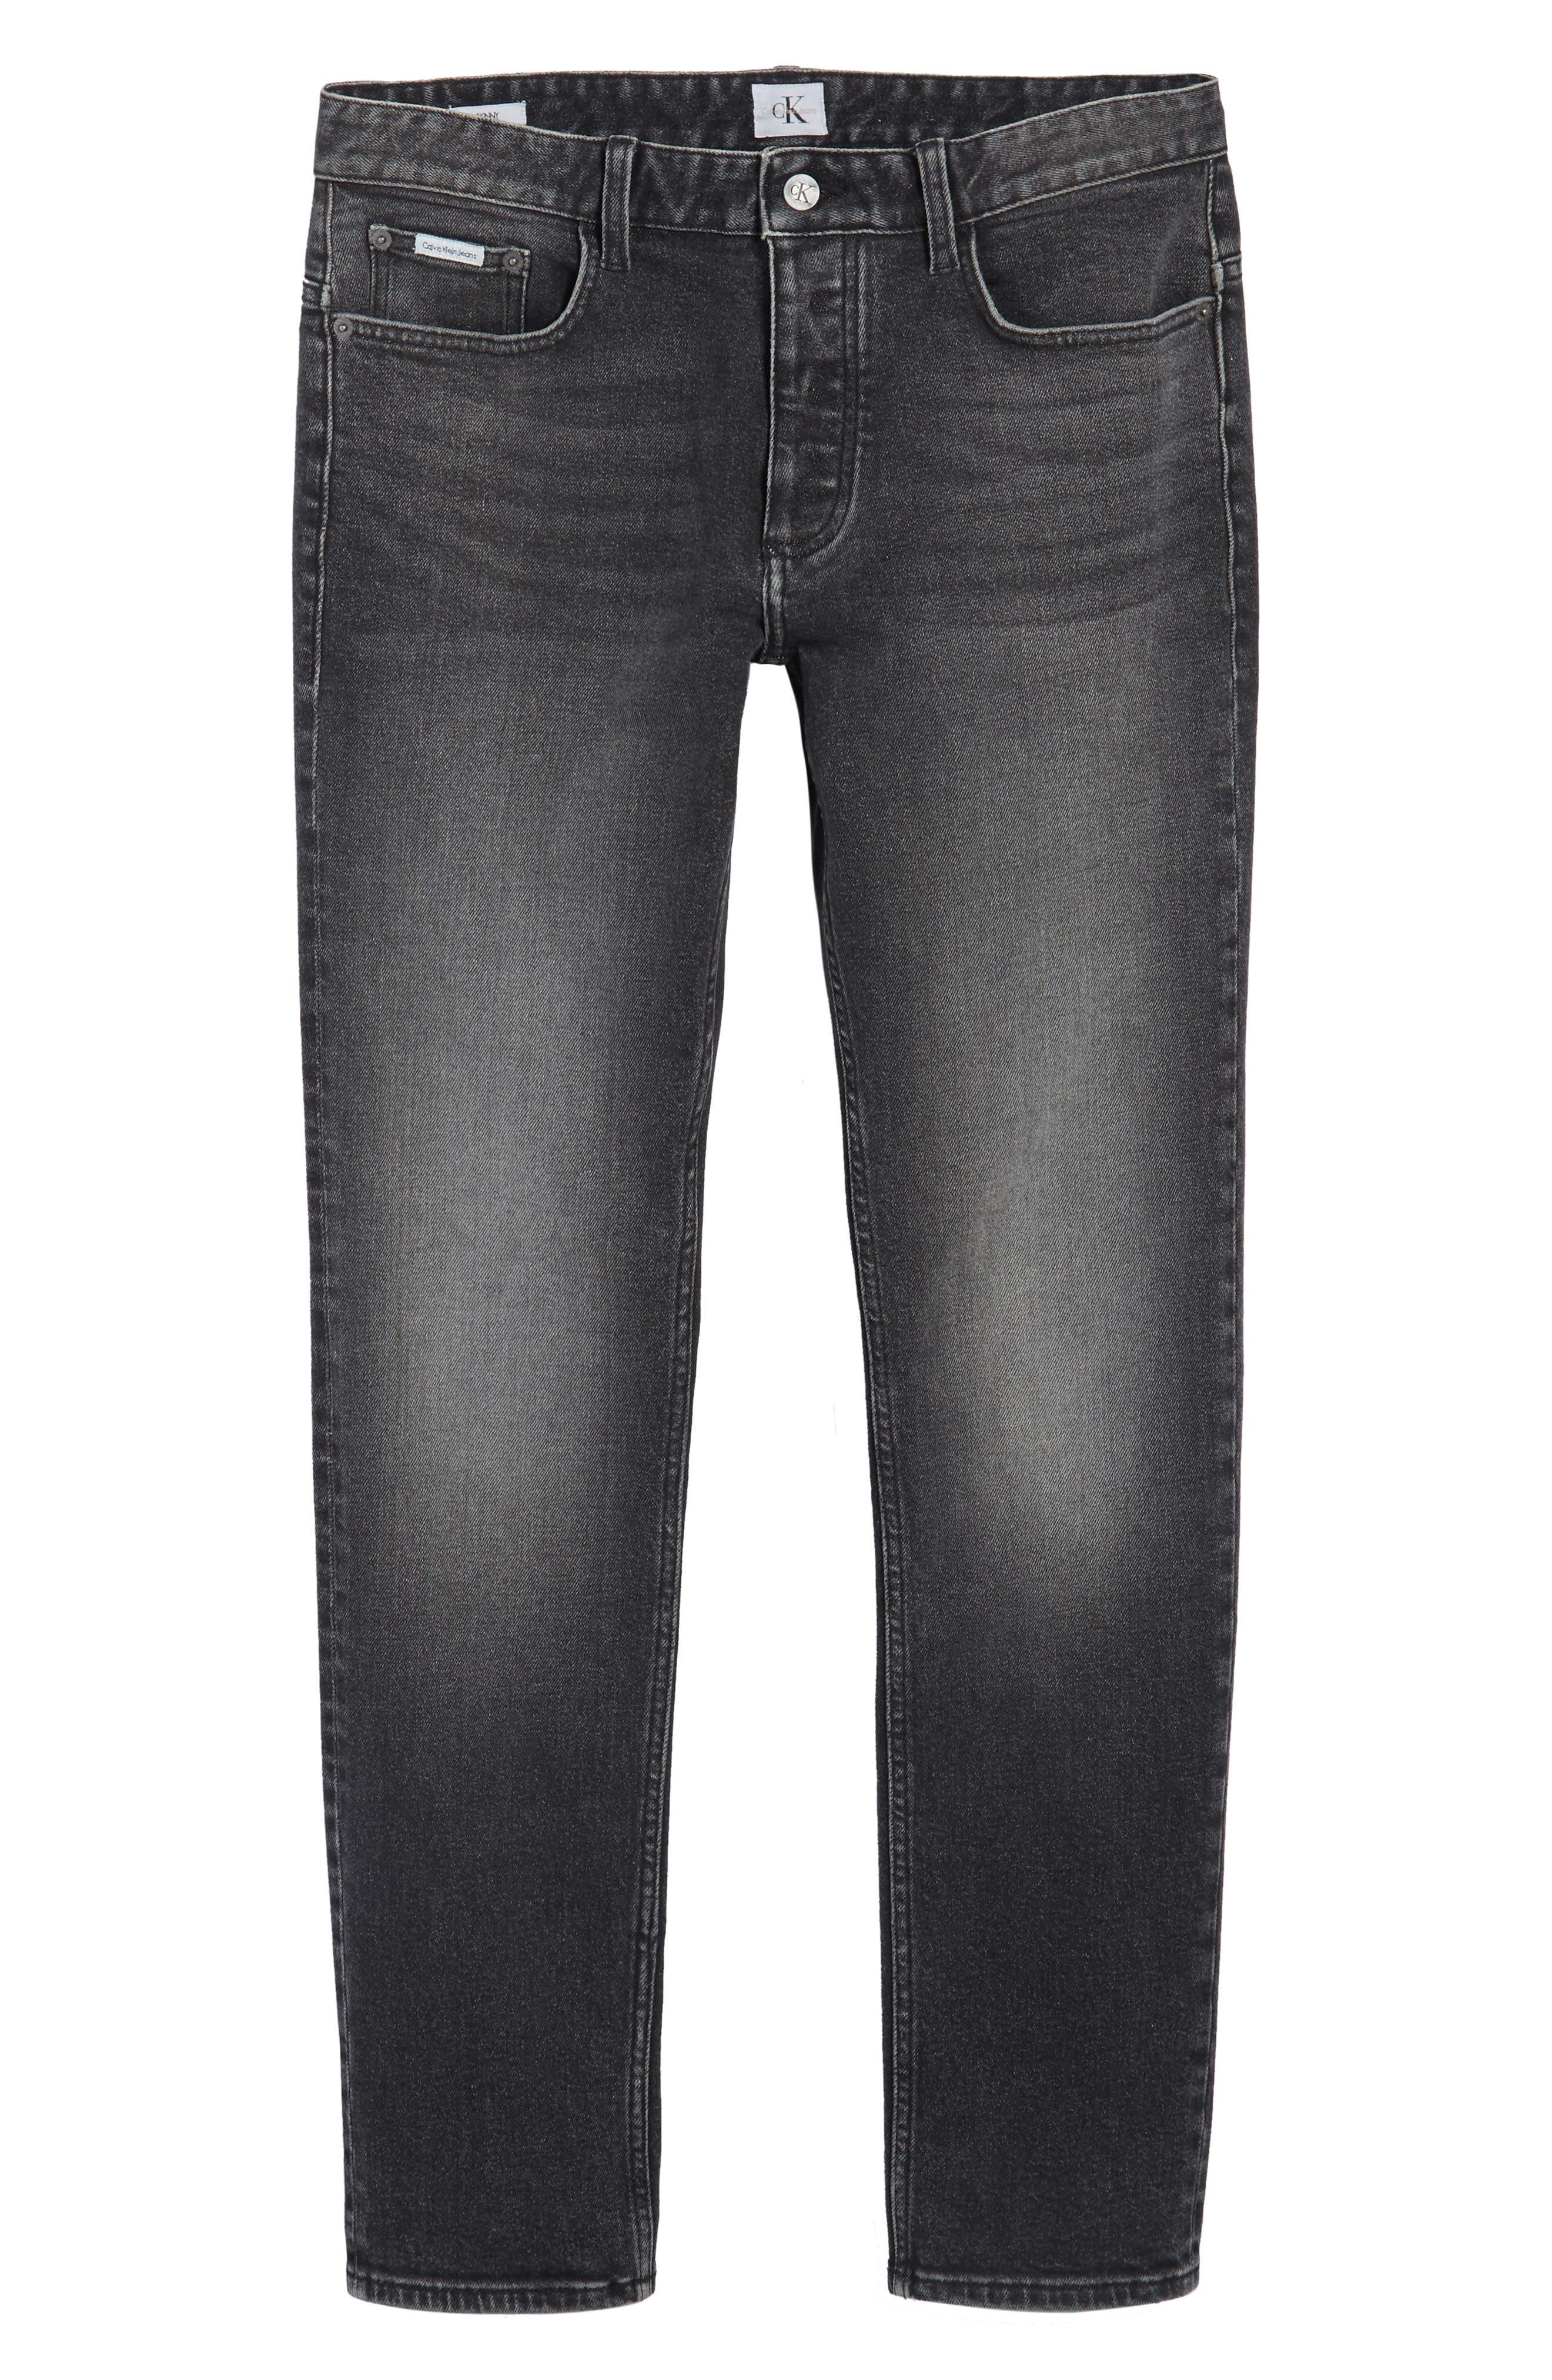 Skinny Jeans,                             Alternate thumbnail 6, color,                             Dark Stone